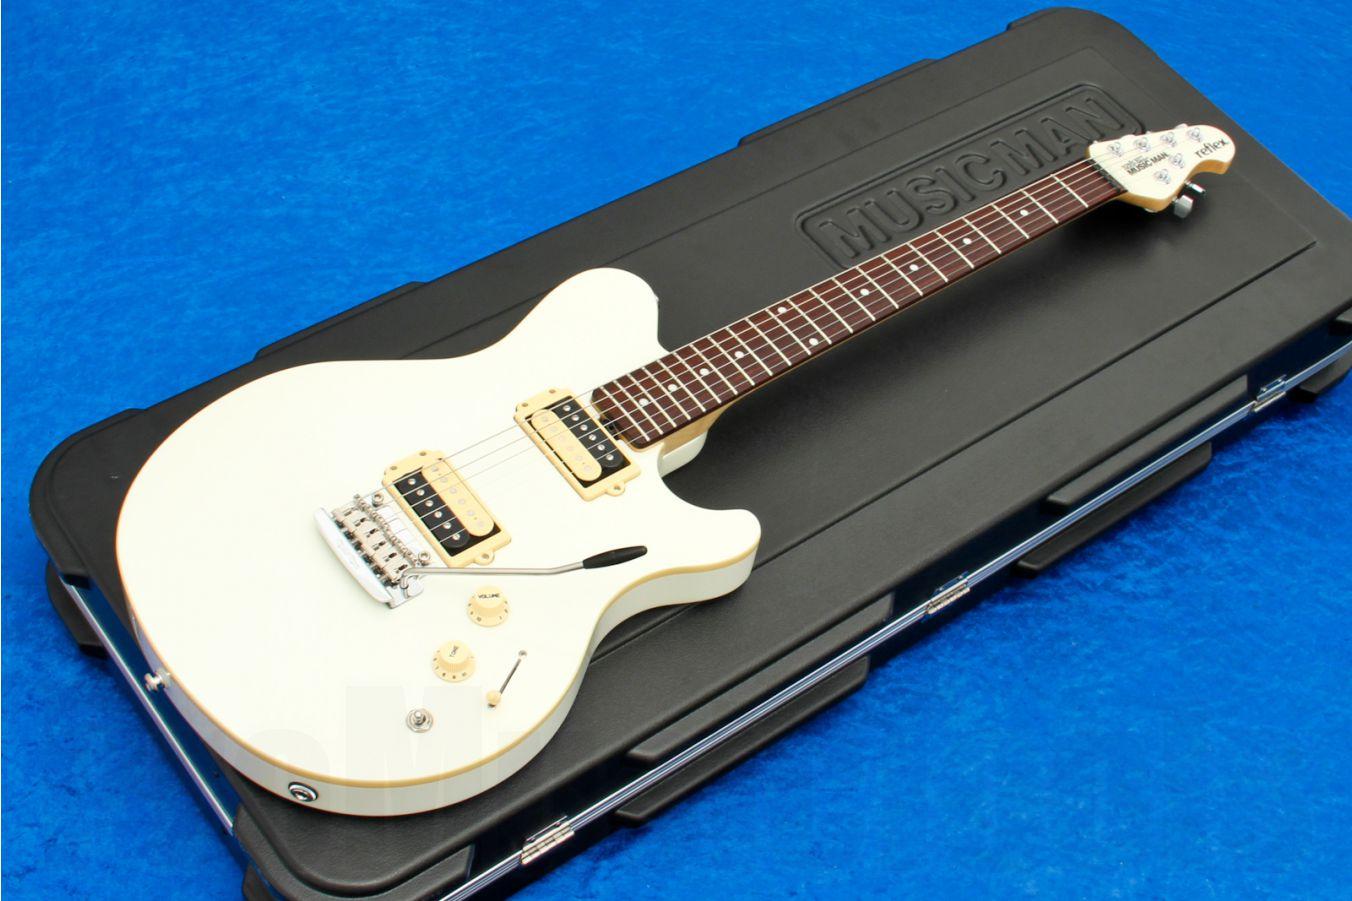 Music Man USA Reflex HH Trem Guitar WH - Vintage White RW